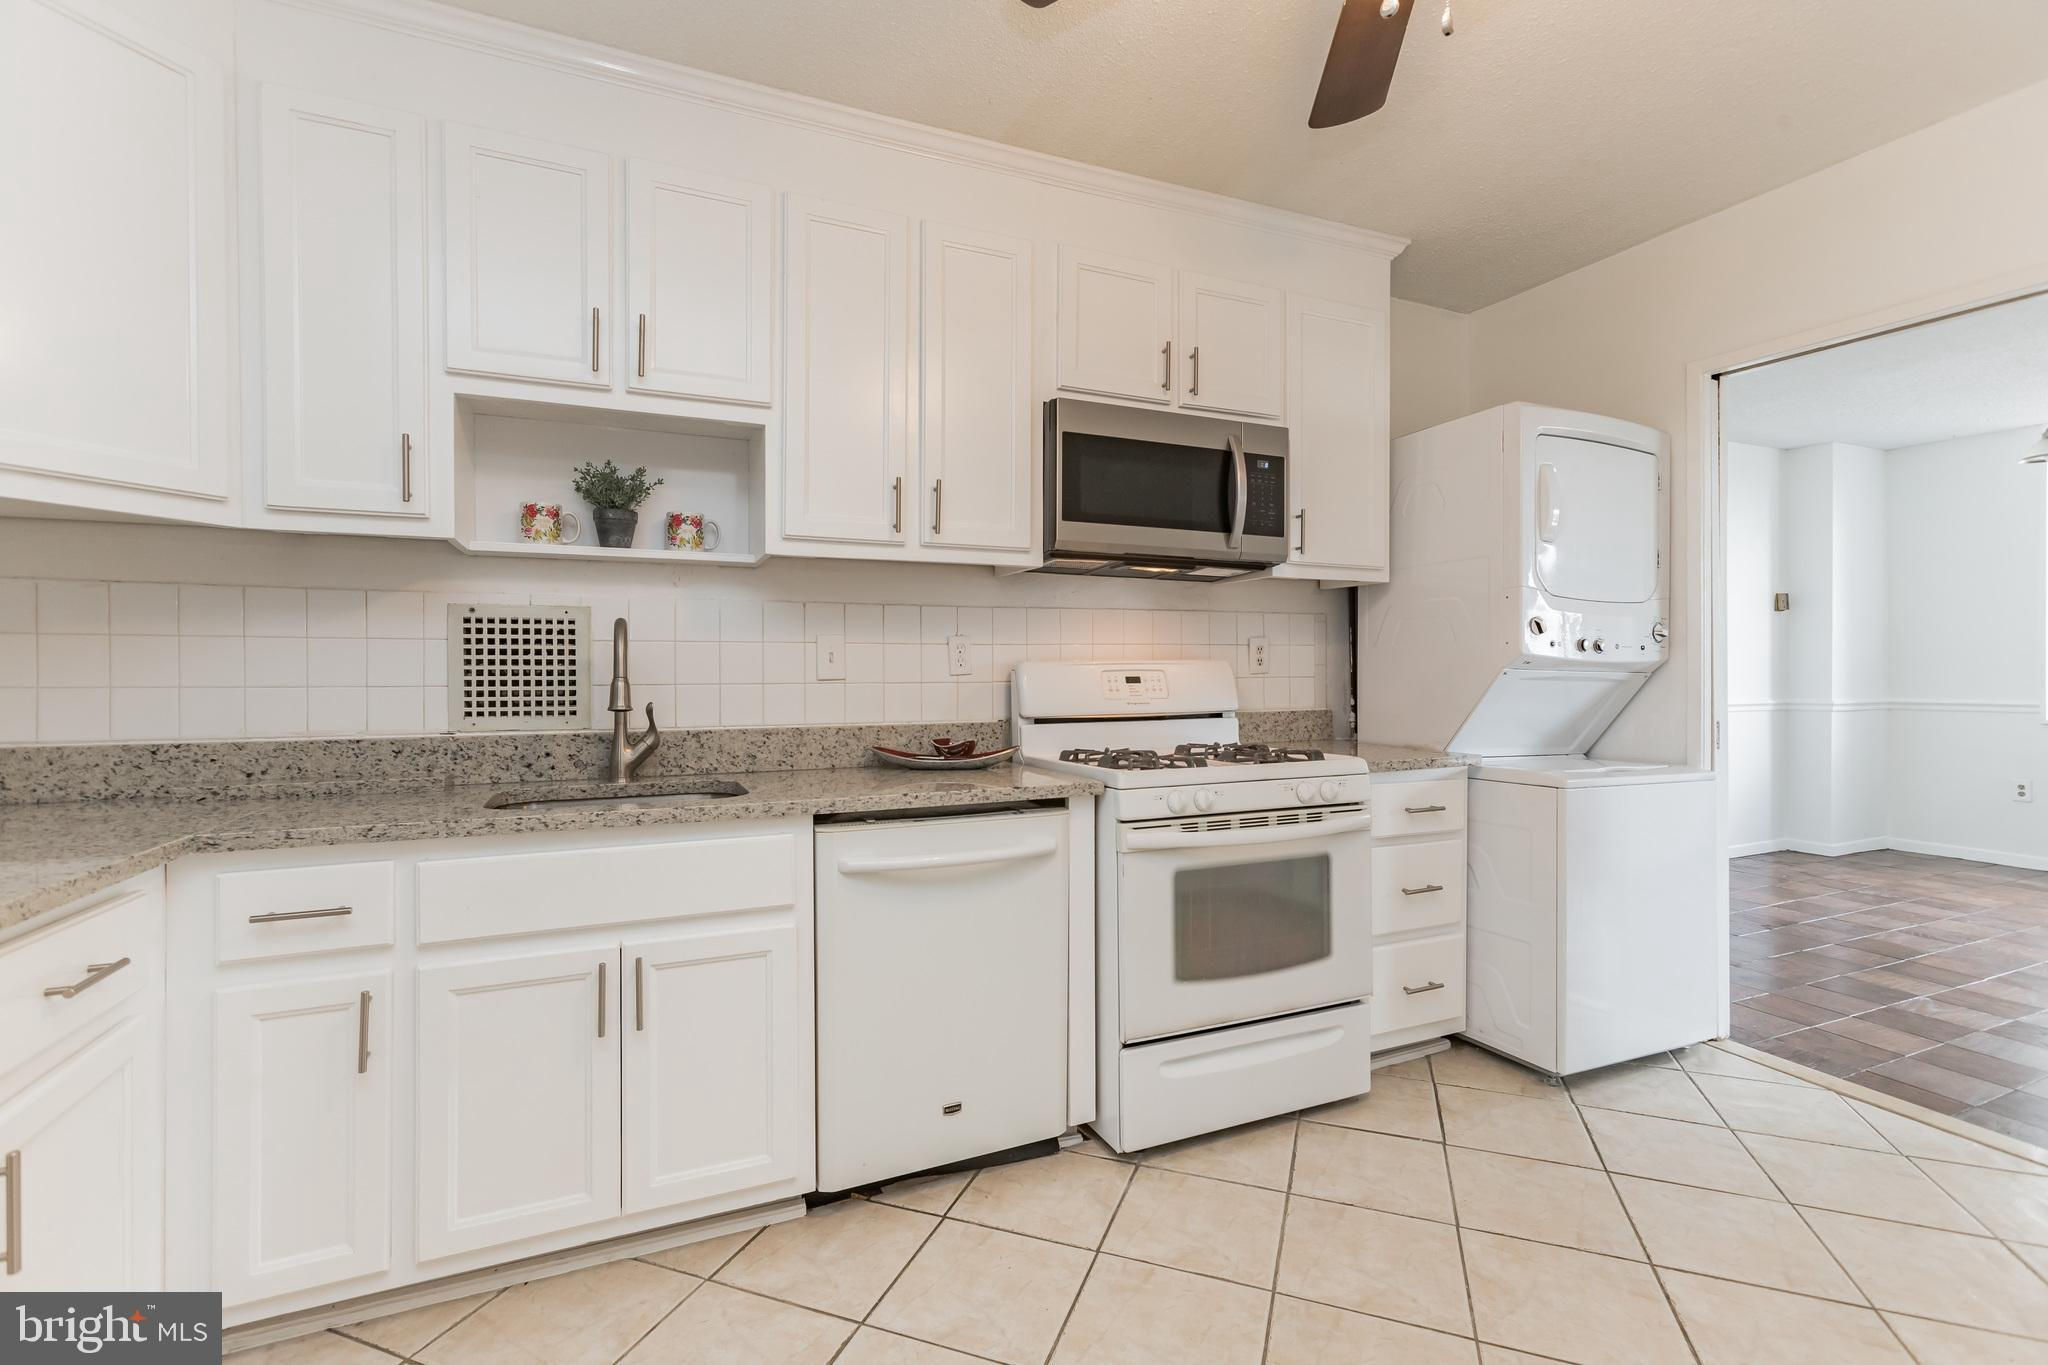 3705 S George Mason Drive #205S, Falls Church, VA 22041 now has a new price of $360,000!